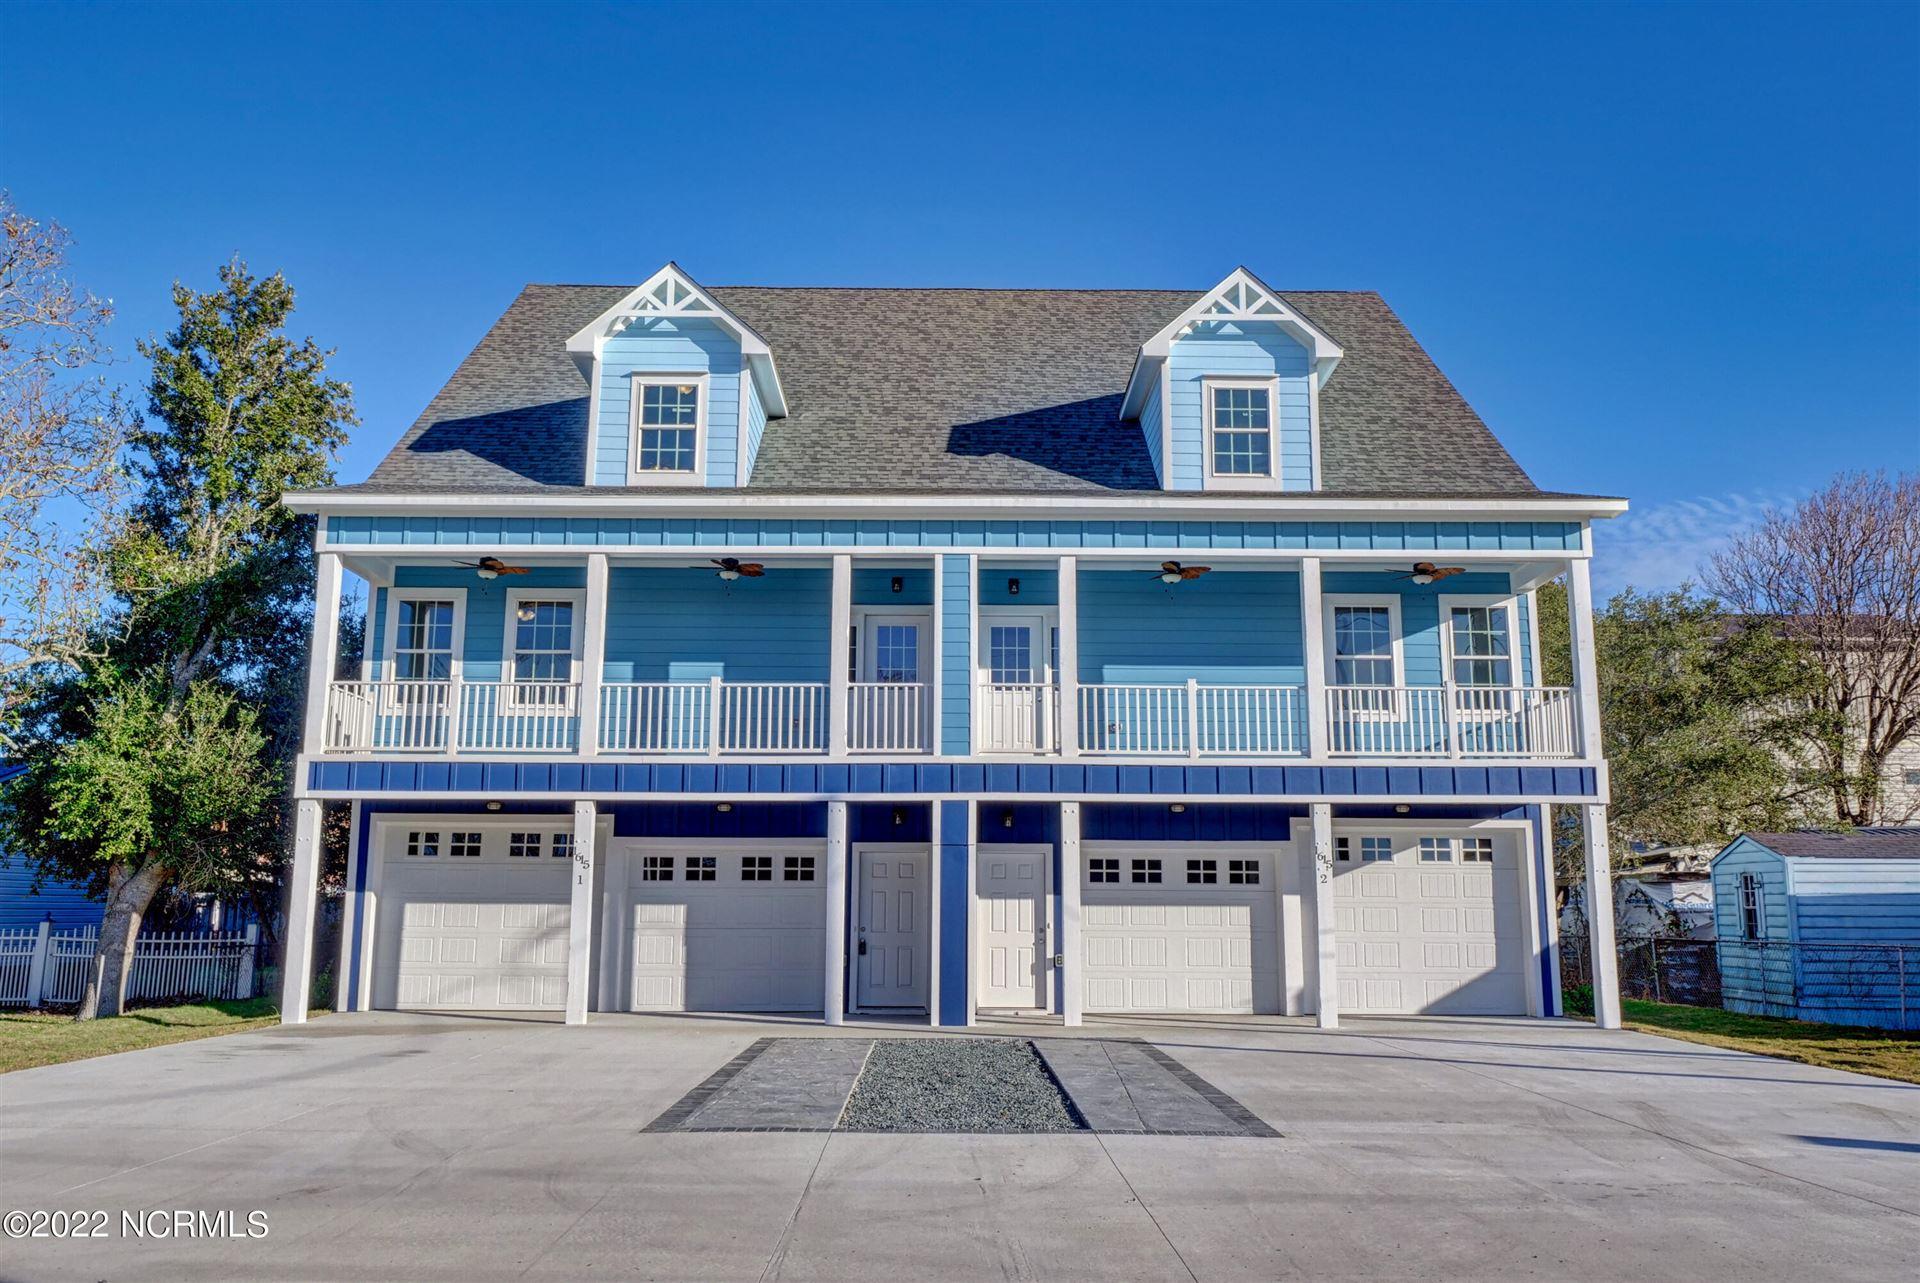 Photo of 1615 Pinfish Lane #2, Carolina Beach, NC 28428 (MLS # 100281100)